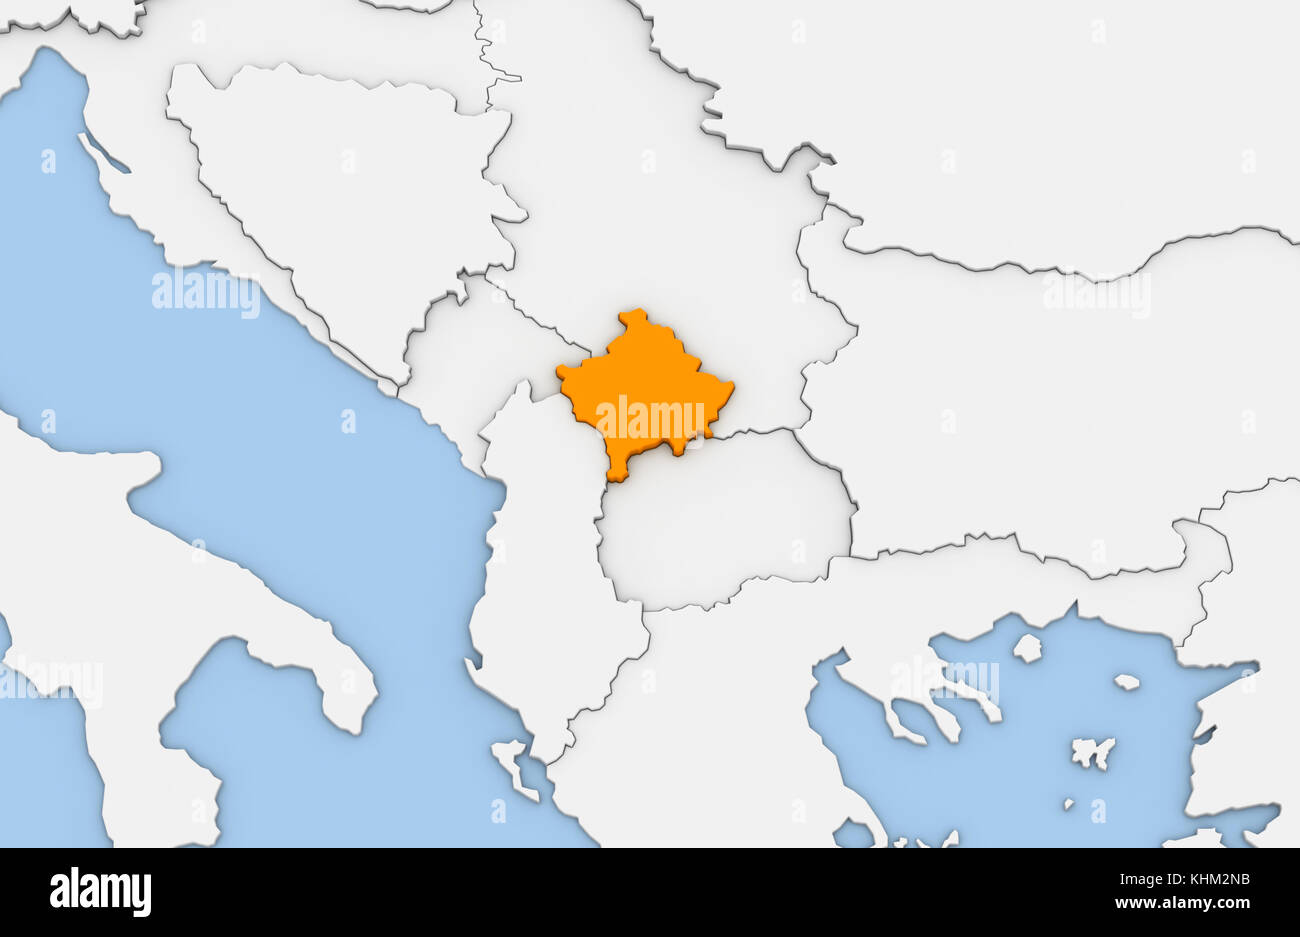 vatican city on world map, laos on world map, syria on world map, macedonia on world map, liechtenstein on world map, the balkans on world map, kurdistan on world map, indonesia on world map, kyrgyzstan on world map, moldova on world map, montenegro on world map, mali on world map, rwanda on world map, armenia on world map, sudan on world map, aegean sea on world map, cyprus on world map, san marino on world map, ukraine on world map, albania on world map, on kosovo on world map